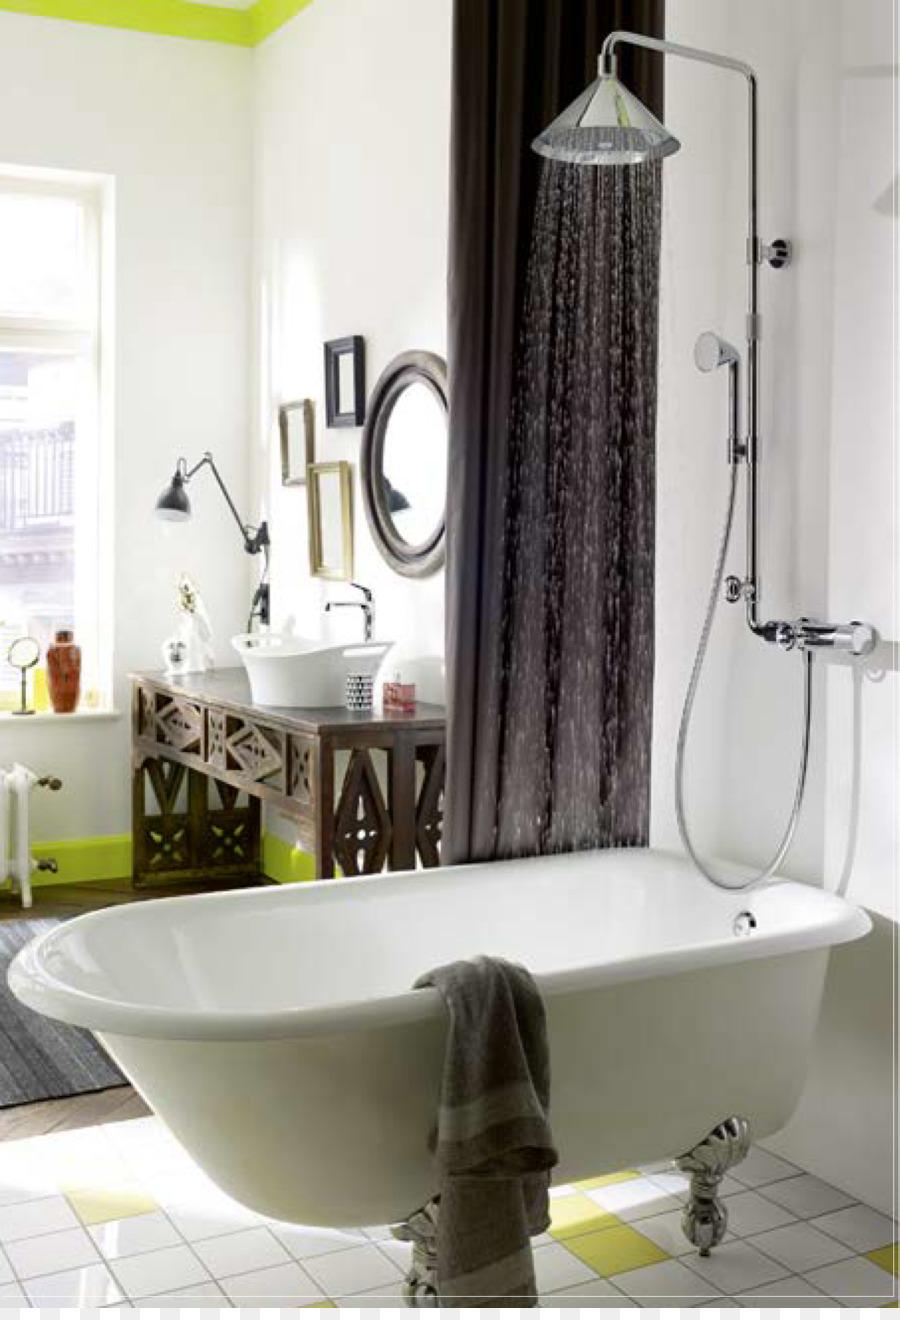 Shower Hansgrohe Bathroom Sink - shower png download - 1359*1975 ...